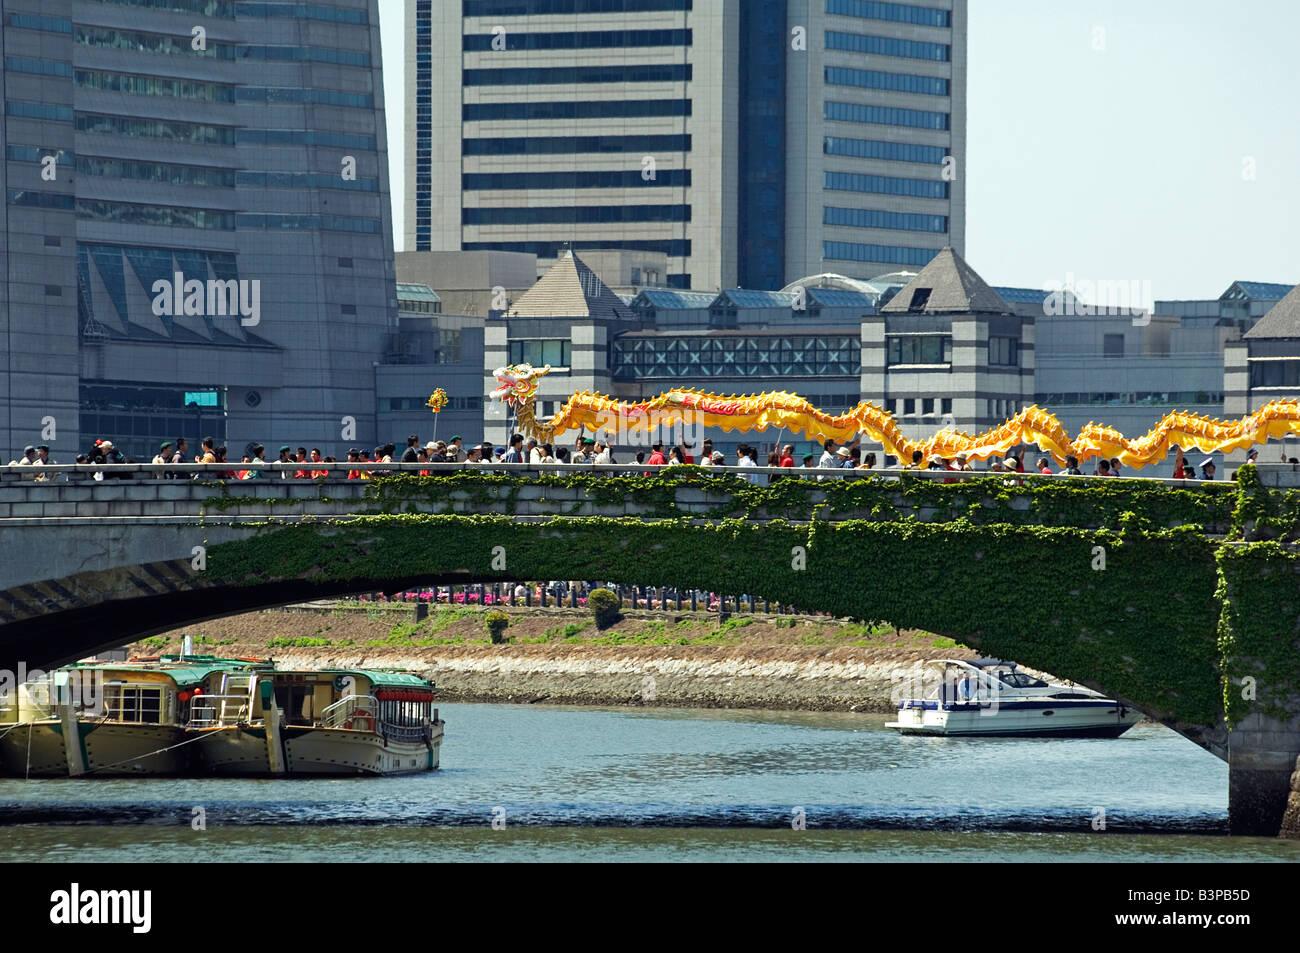 Japan, Kanagawa prefecture, Yokohama. Chinese Dragon dancers crossing the city bridge during the International parade. - Stock Image